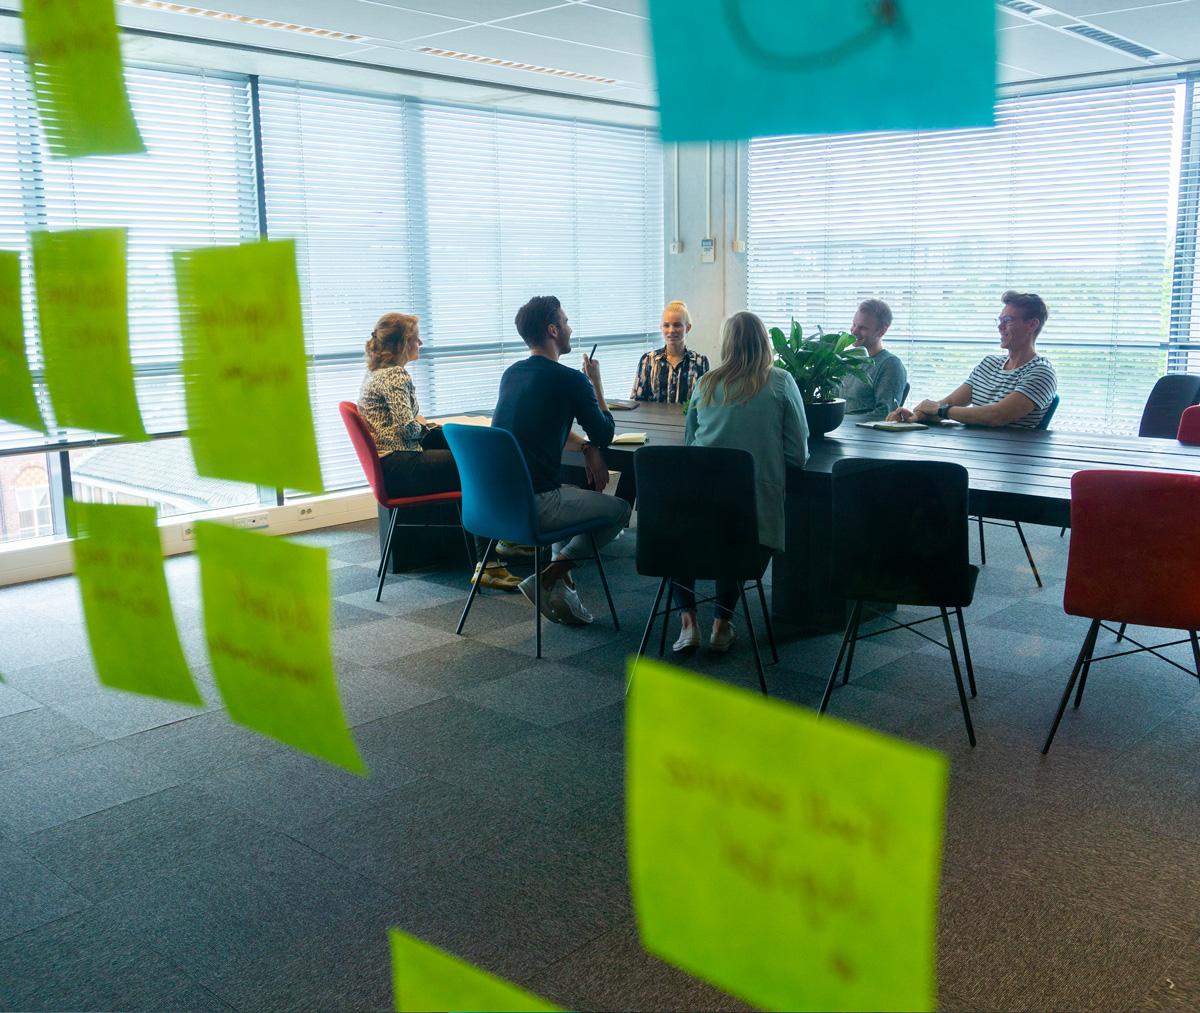 Maatwerk WordPress website laten bouwen? - Dutchwebdesign